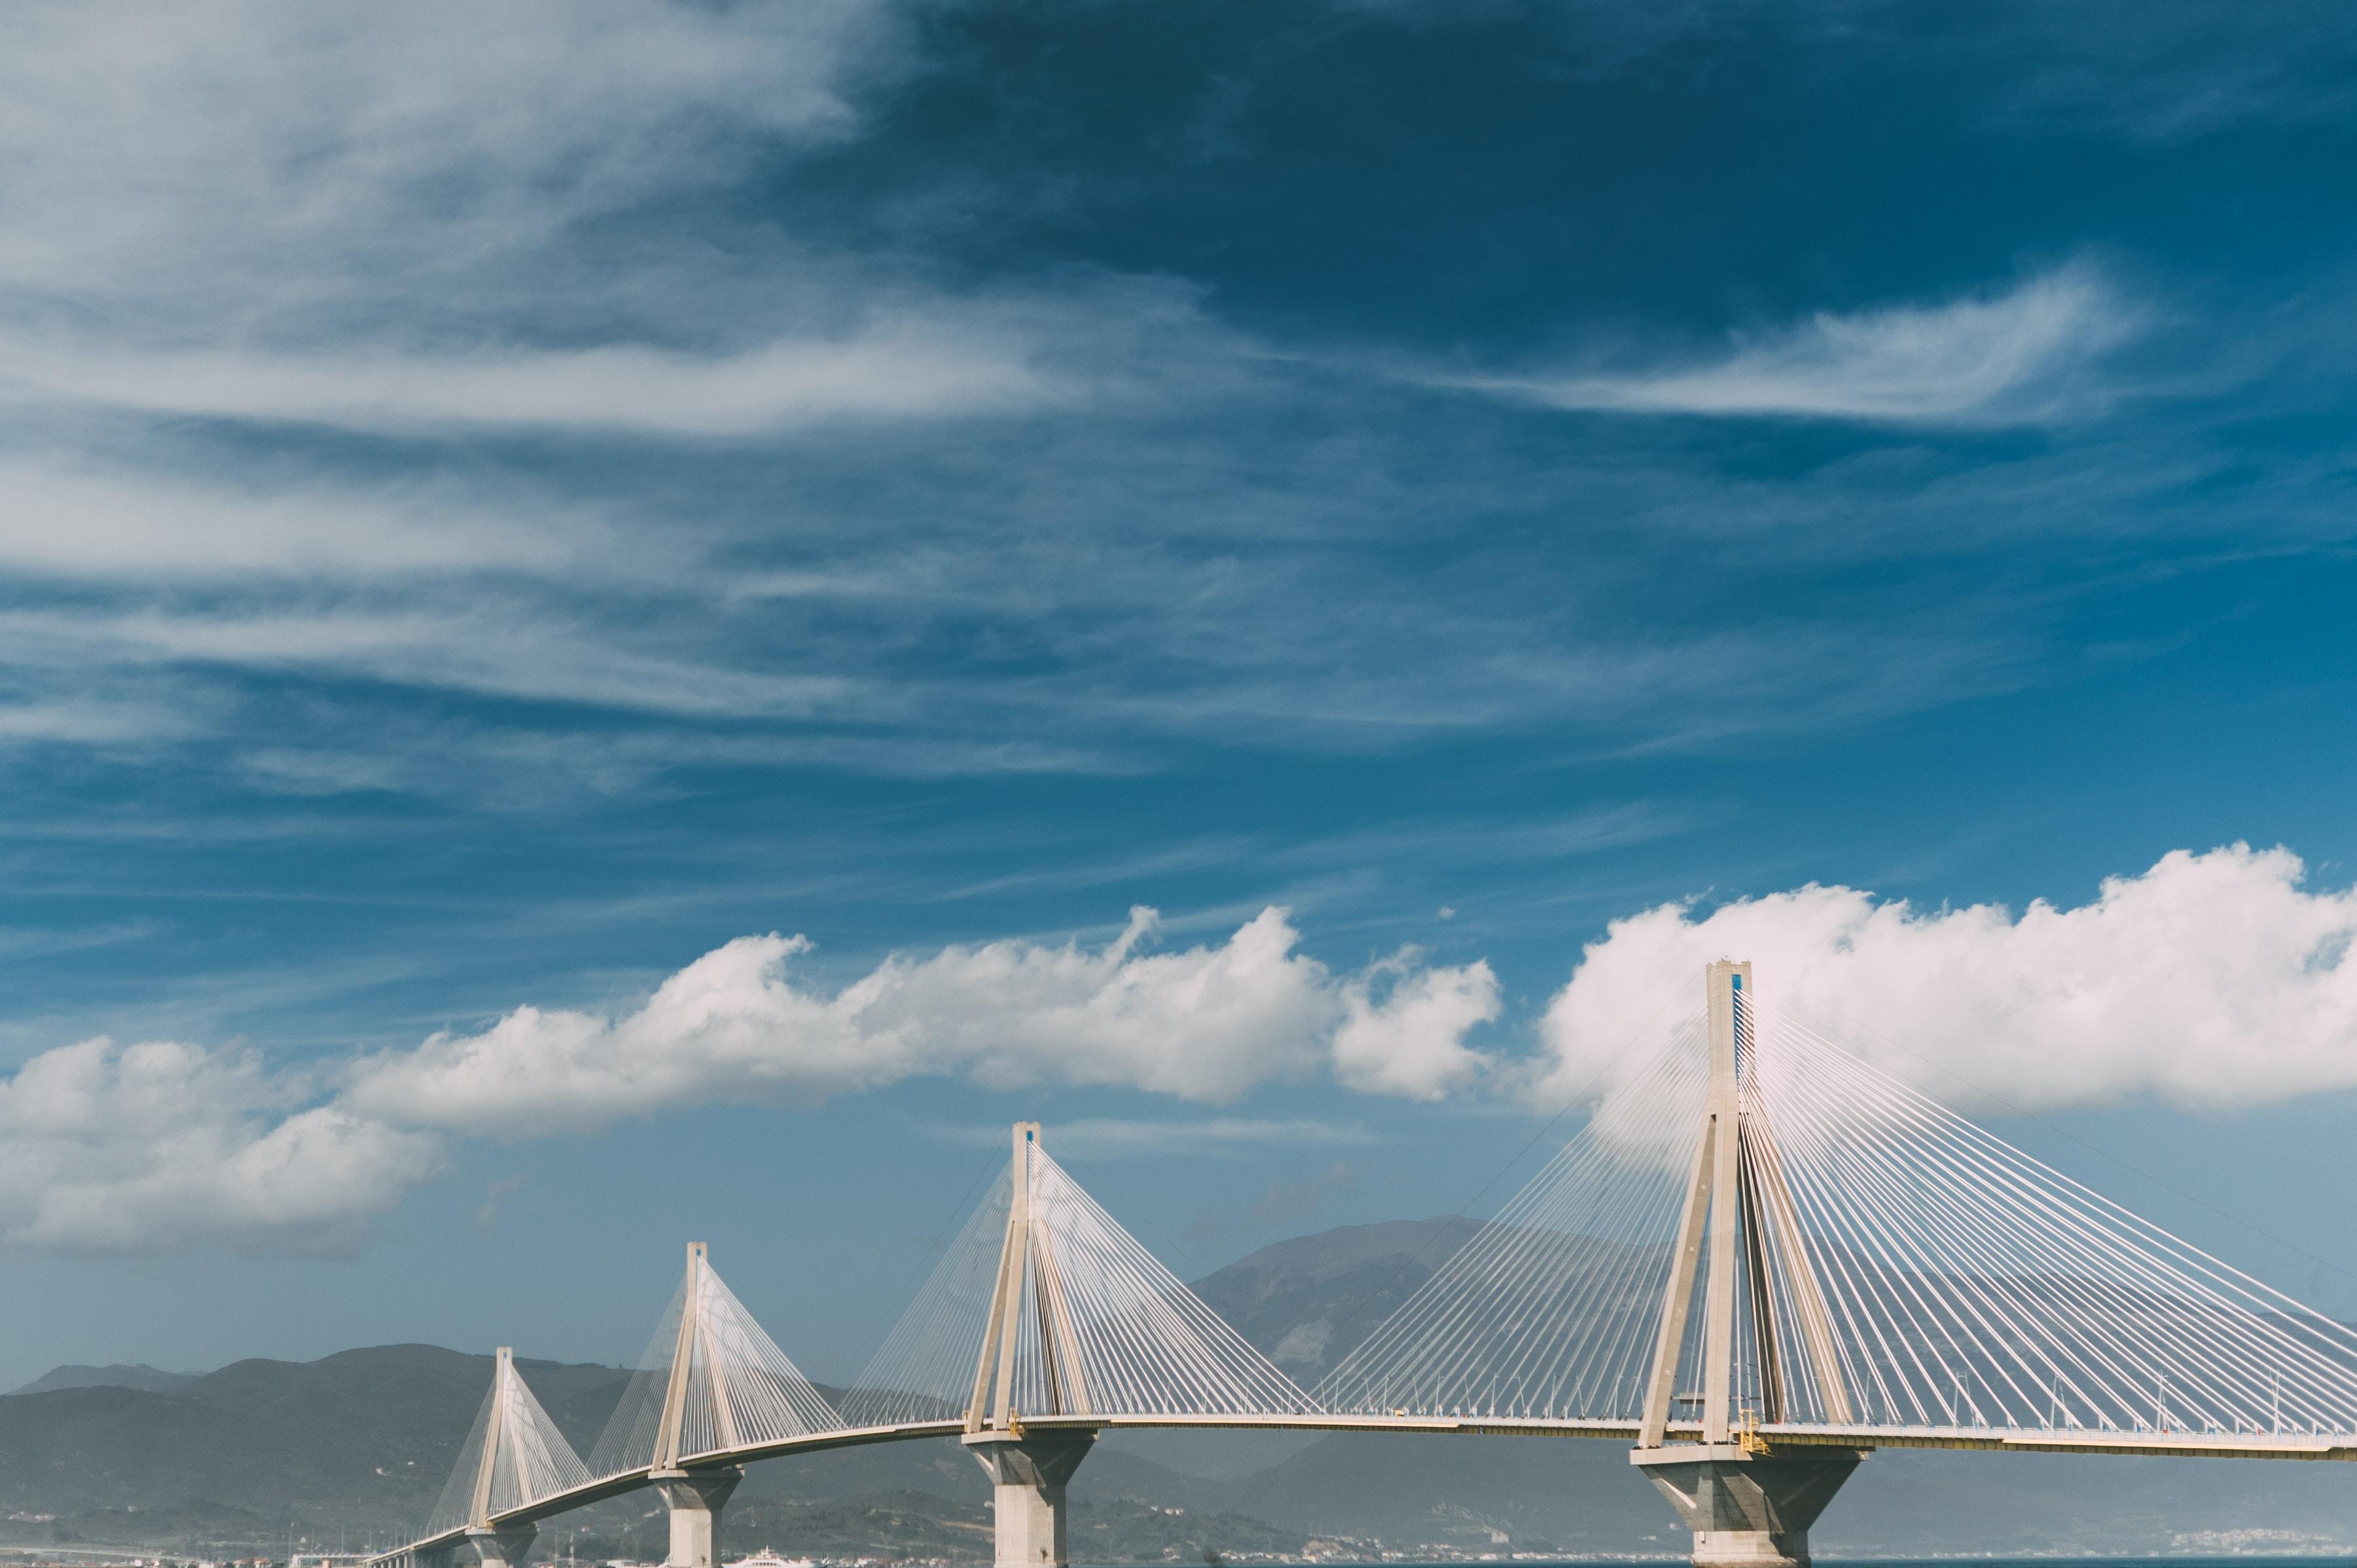 white cantilever bridge under blue sky